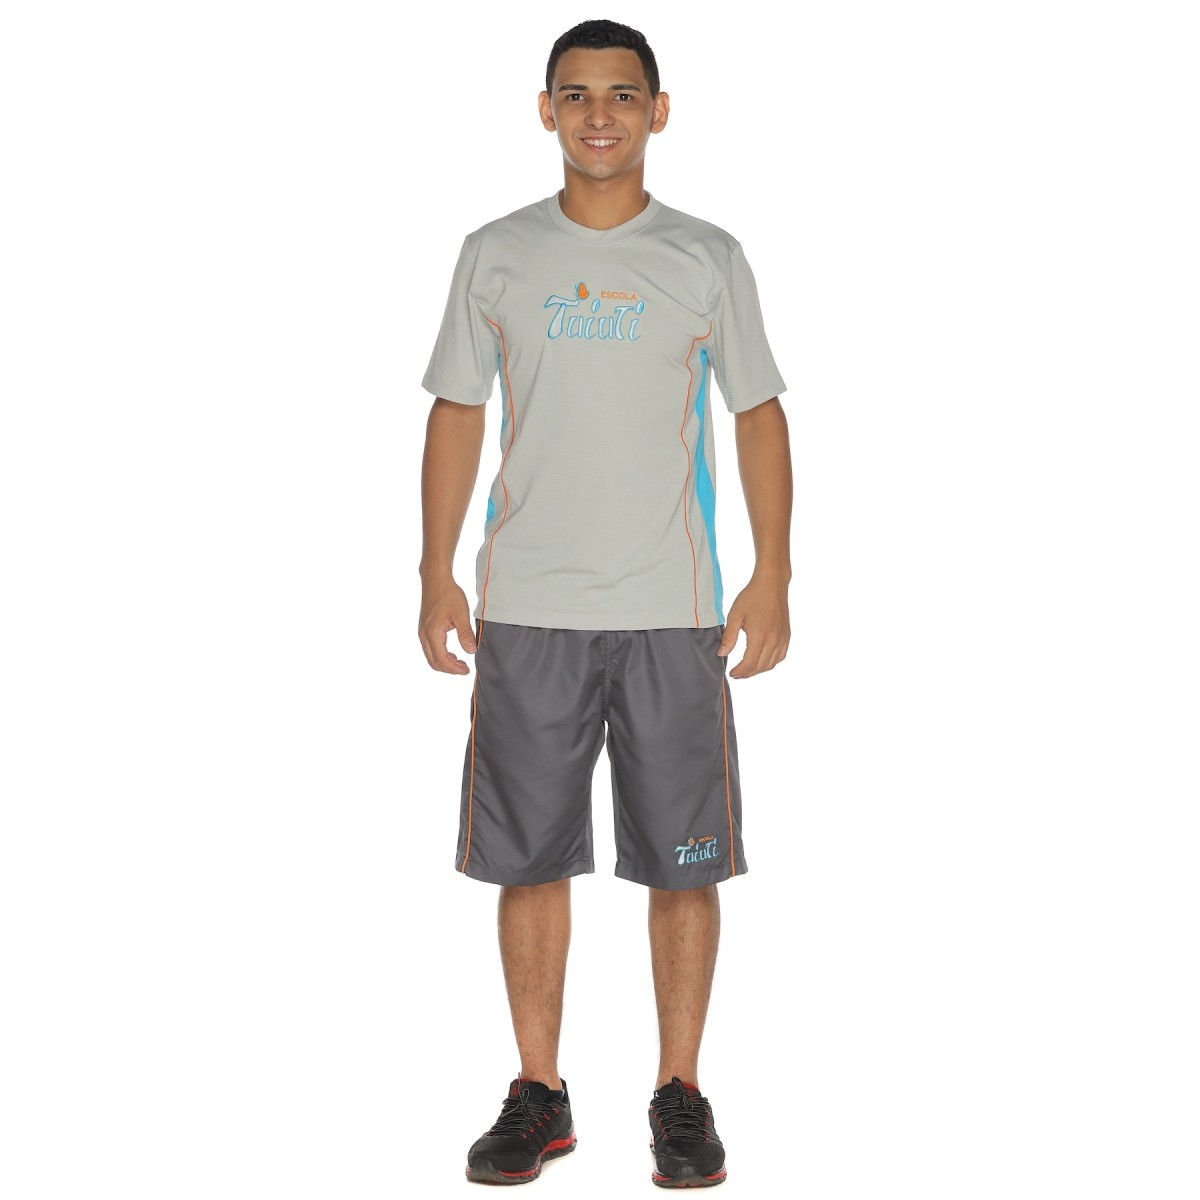 Camiseta Manga Curta PV - Colégio Tuiuti